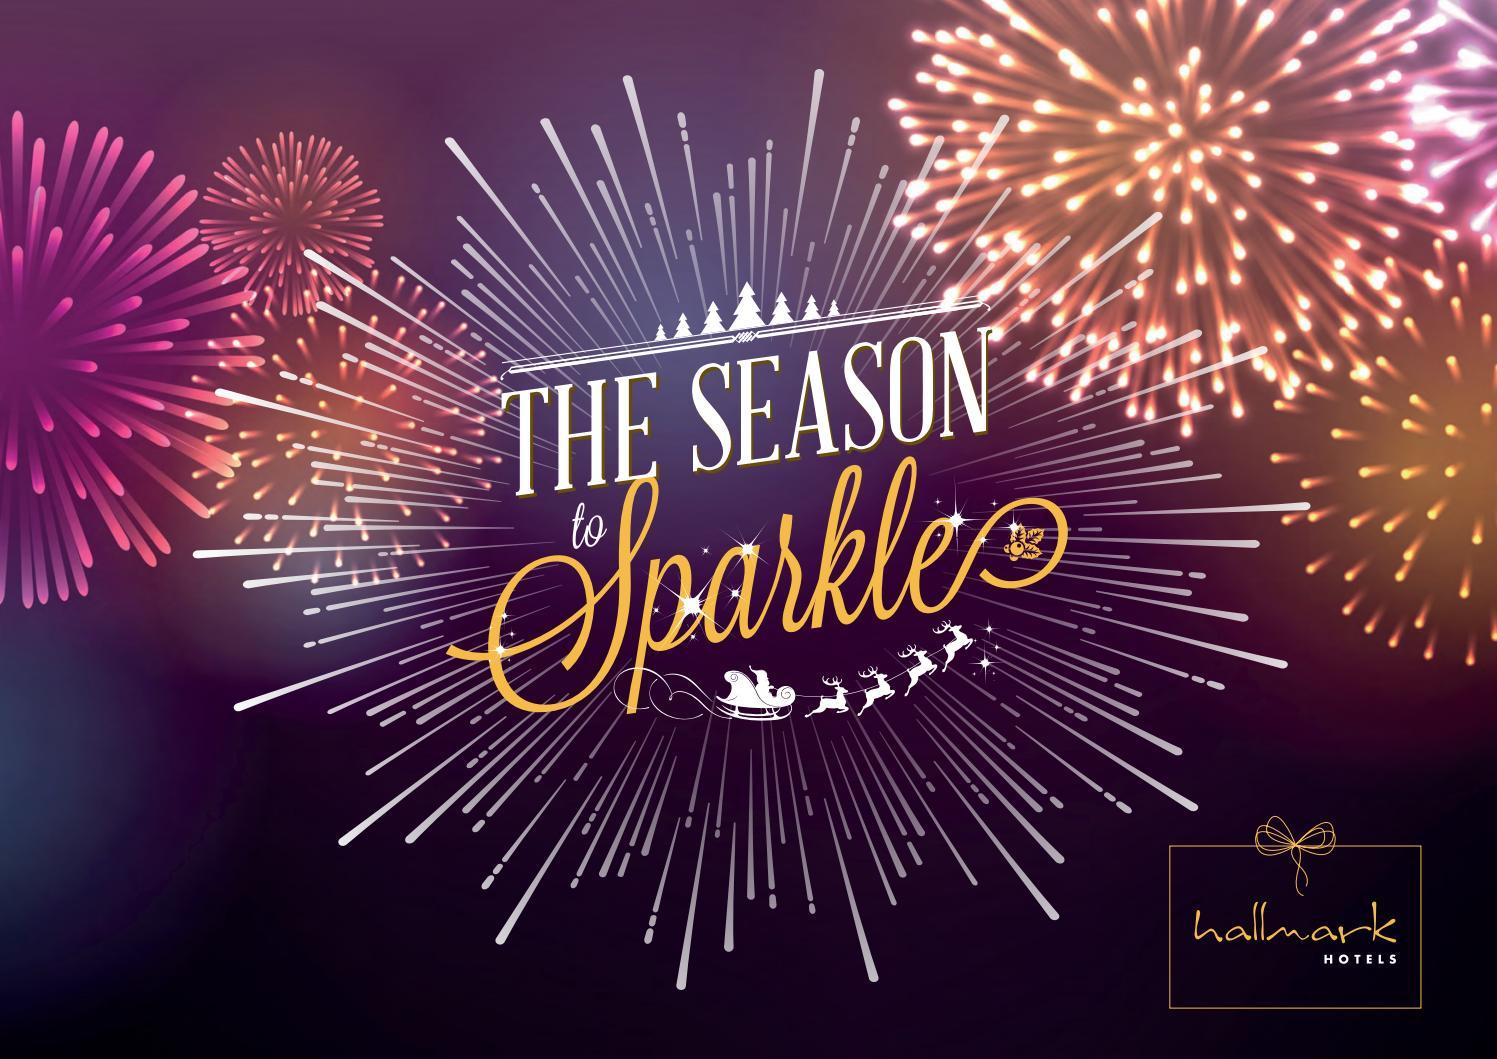 christmas brochure 2016 hallmark hotel london croydon aerodrome by james adam issuu - Purple Hotel 2016